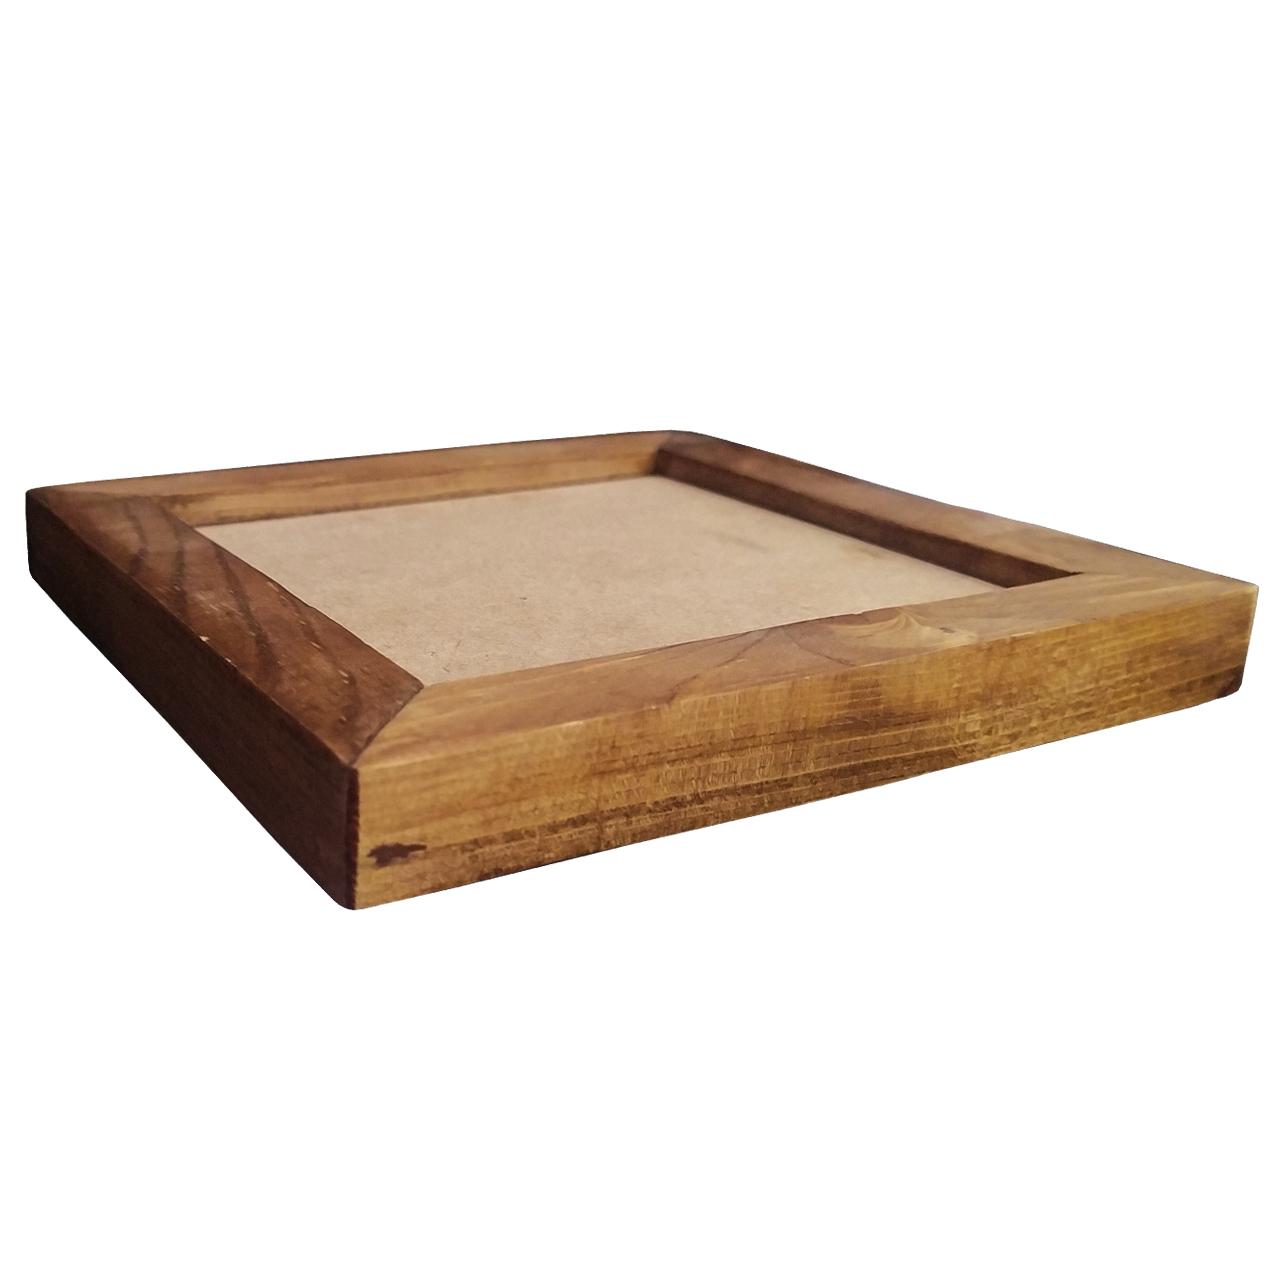 خرید                      تابلو کاشی کاری طرح میز و صندلی و بشقاب کد 846